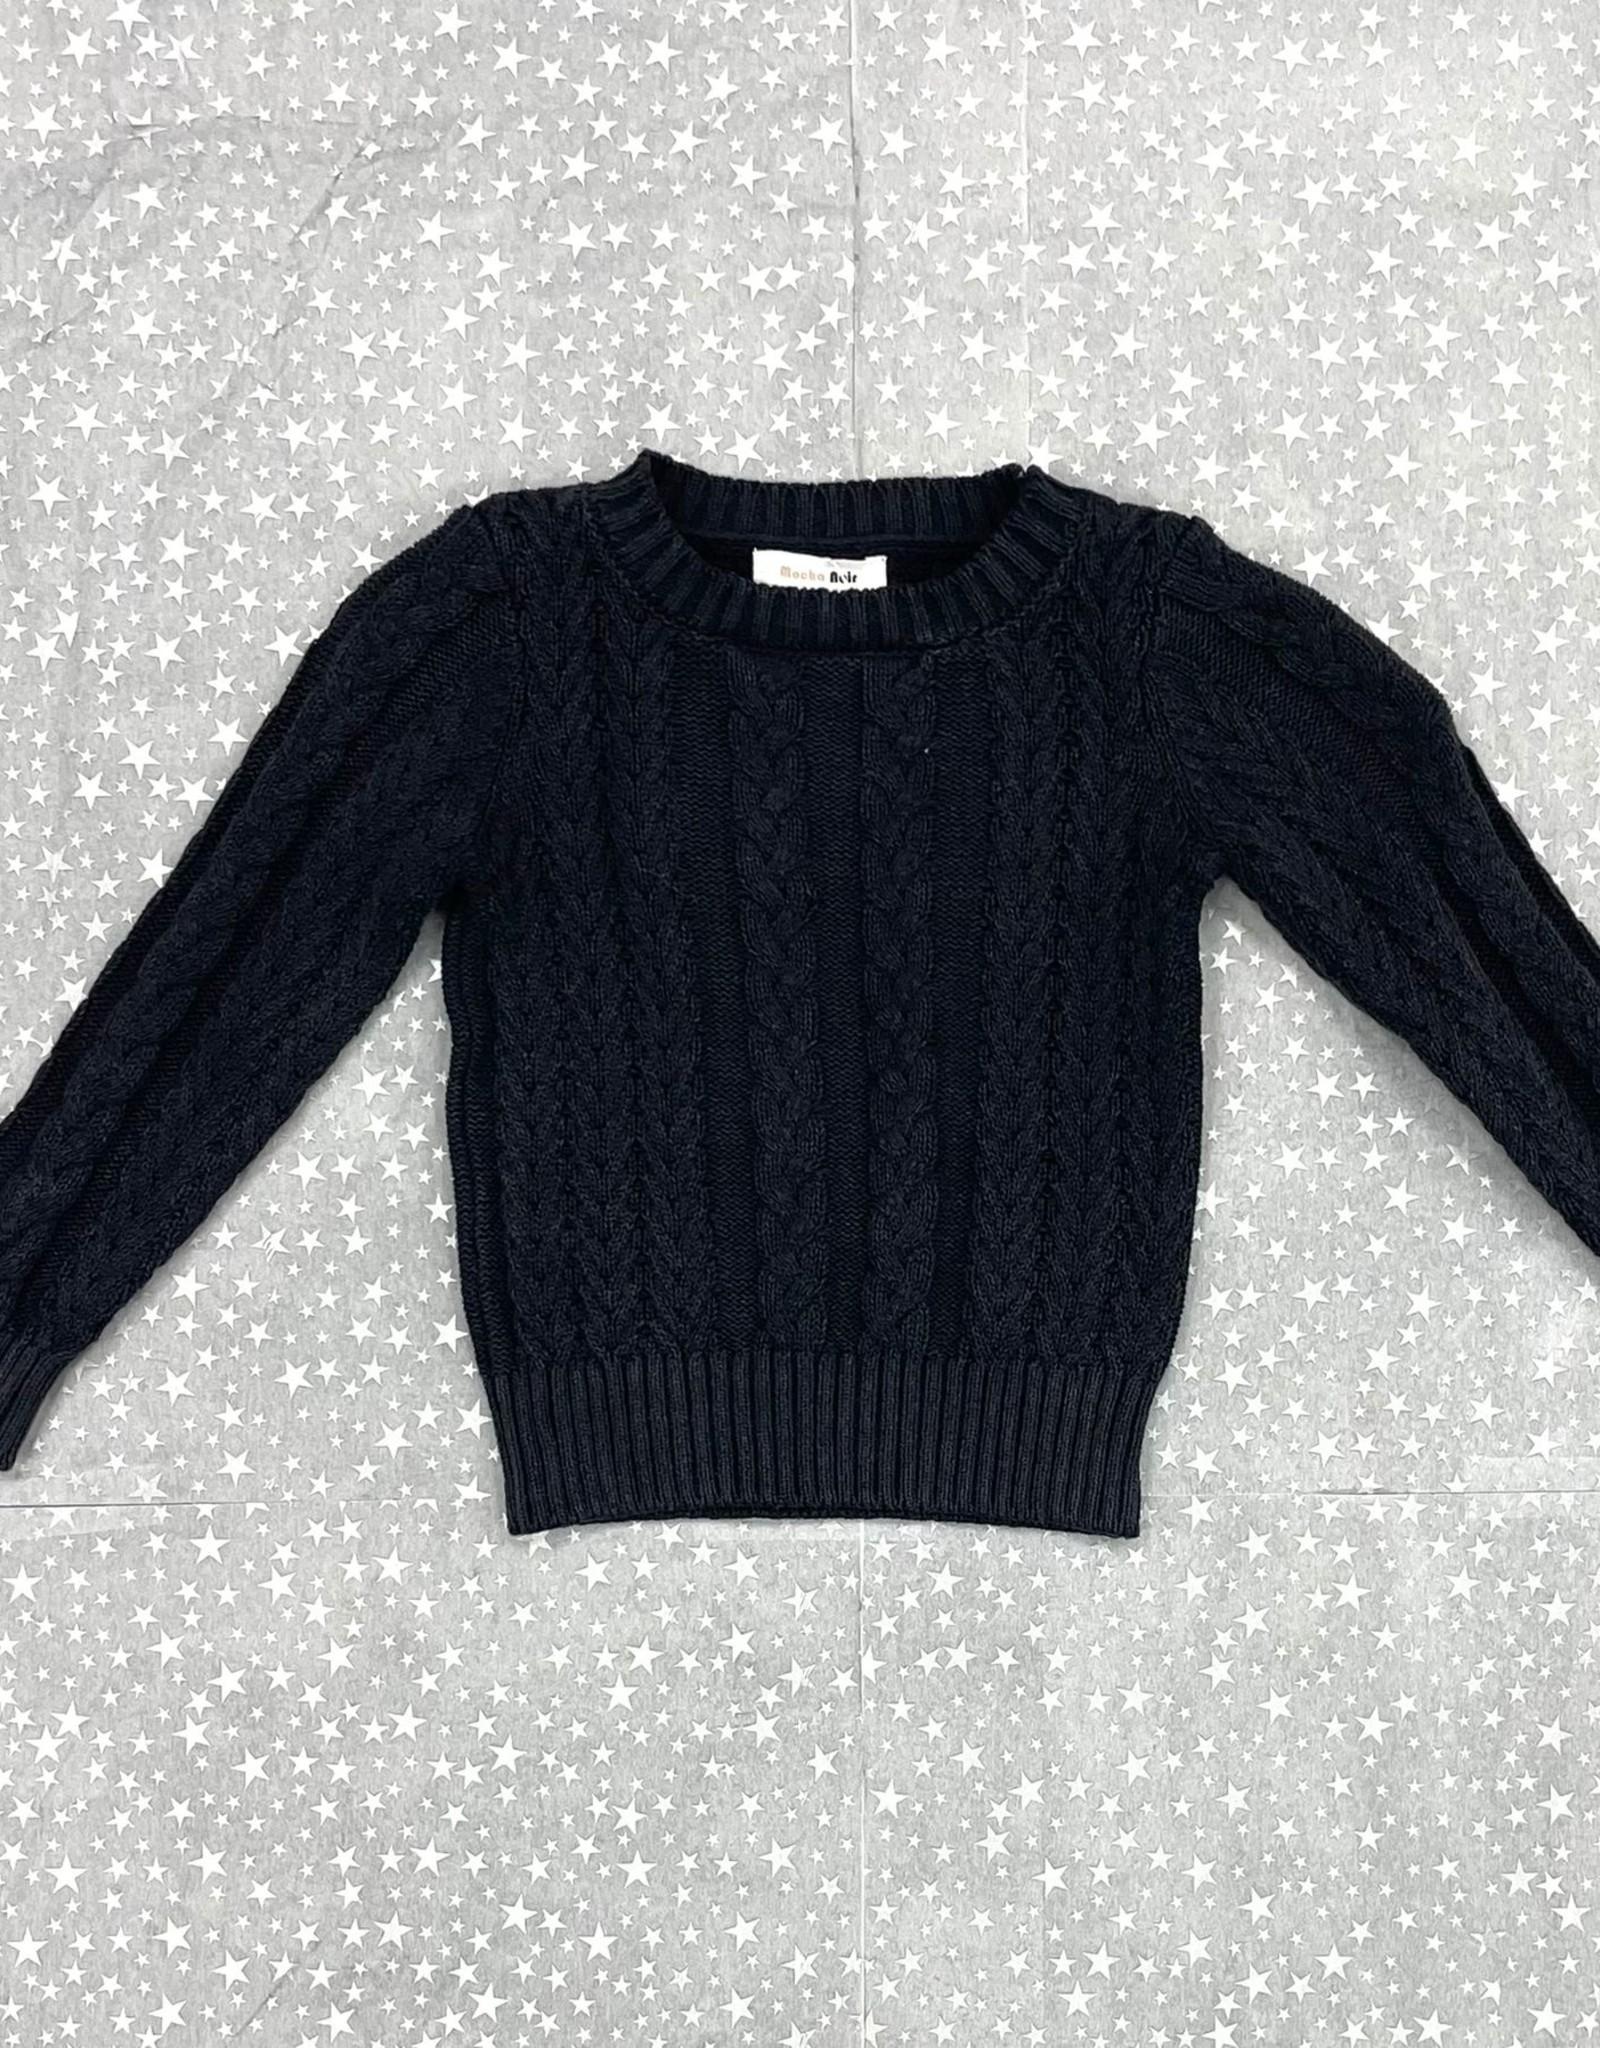 Mocha Noir Mocha Noir Cable Knit and Rib Sweater